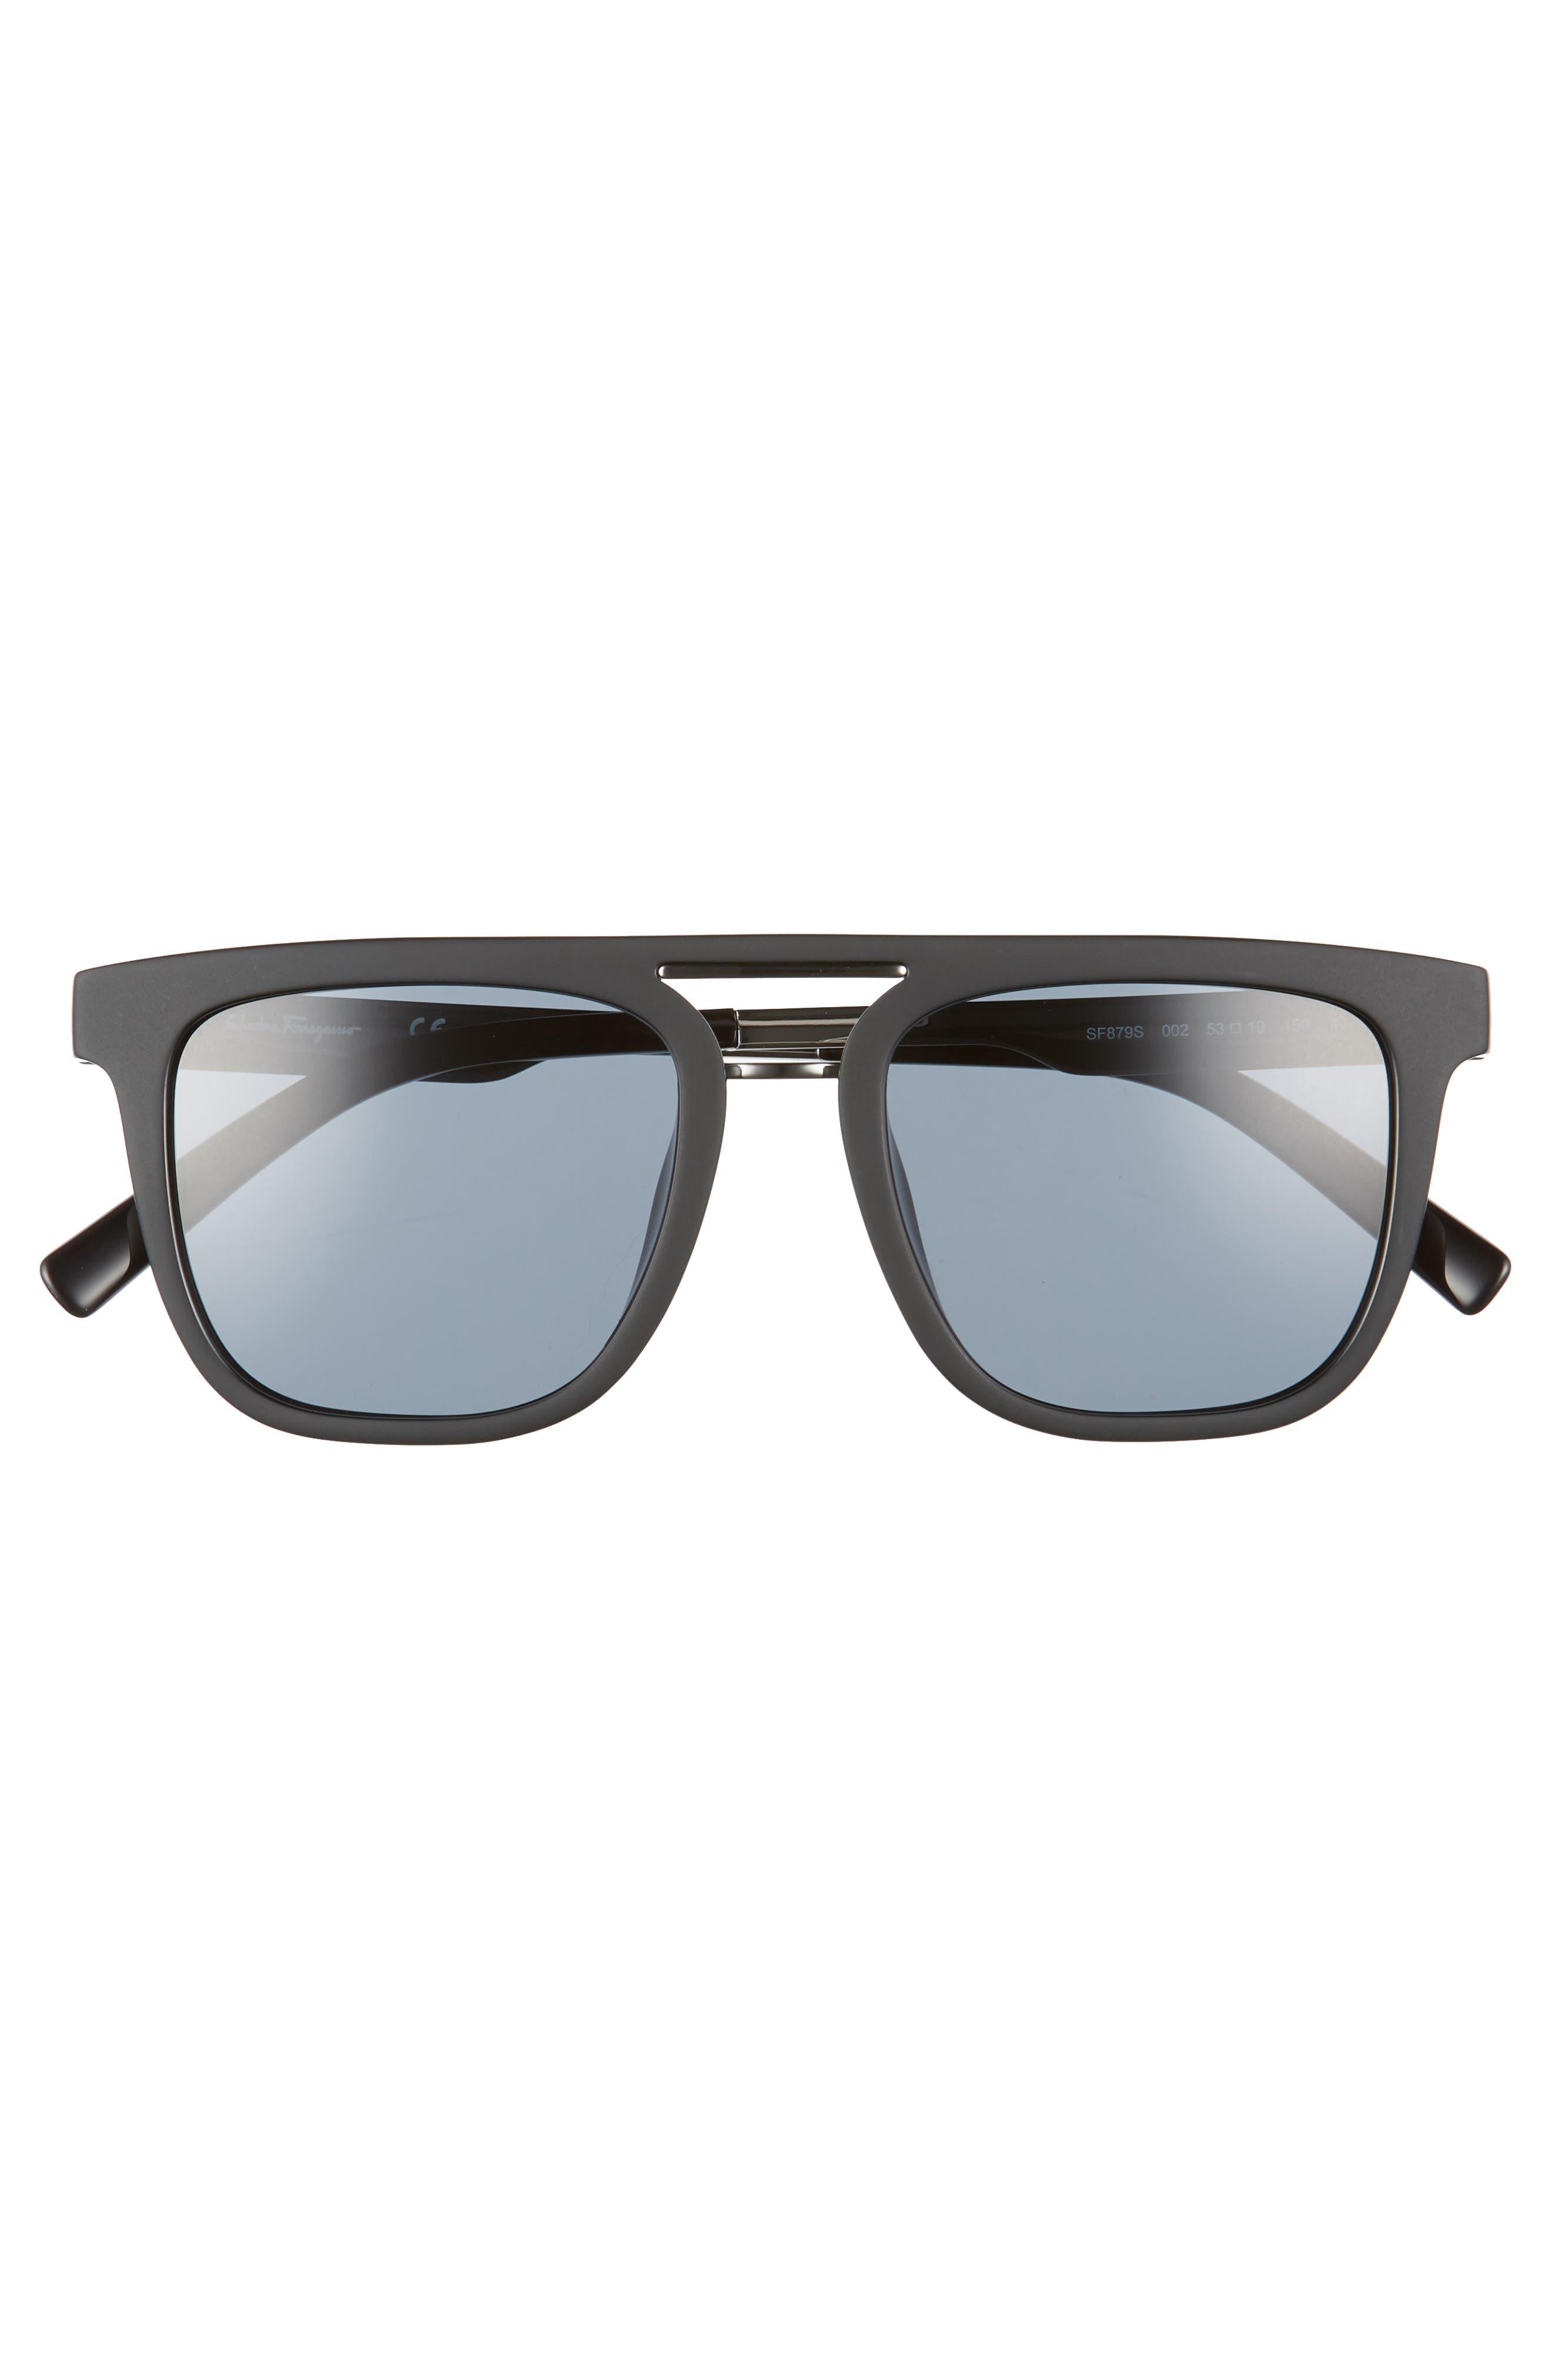 53mm Sunglasses,                             Alternate thumbnail 2, color,                             MATTE BLACK